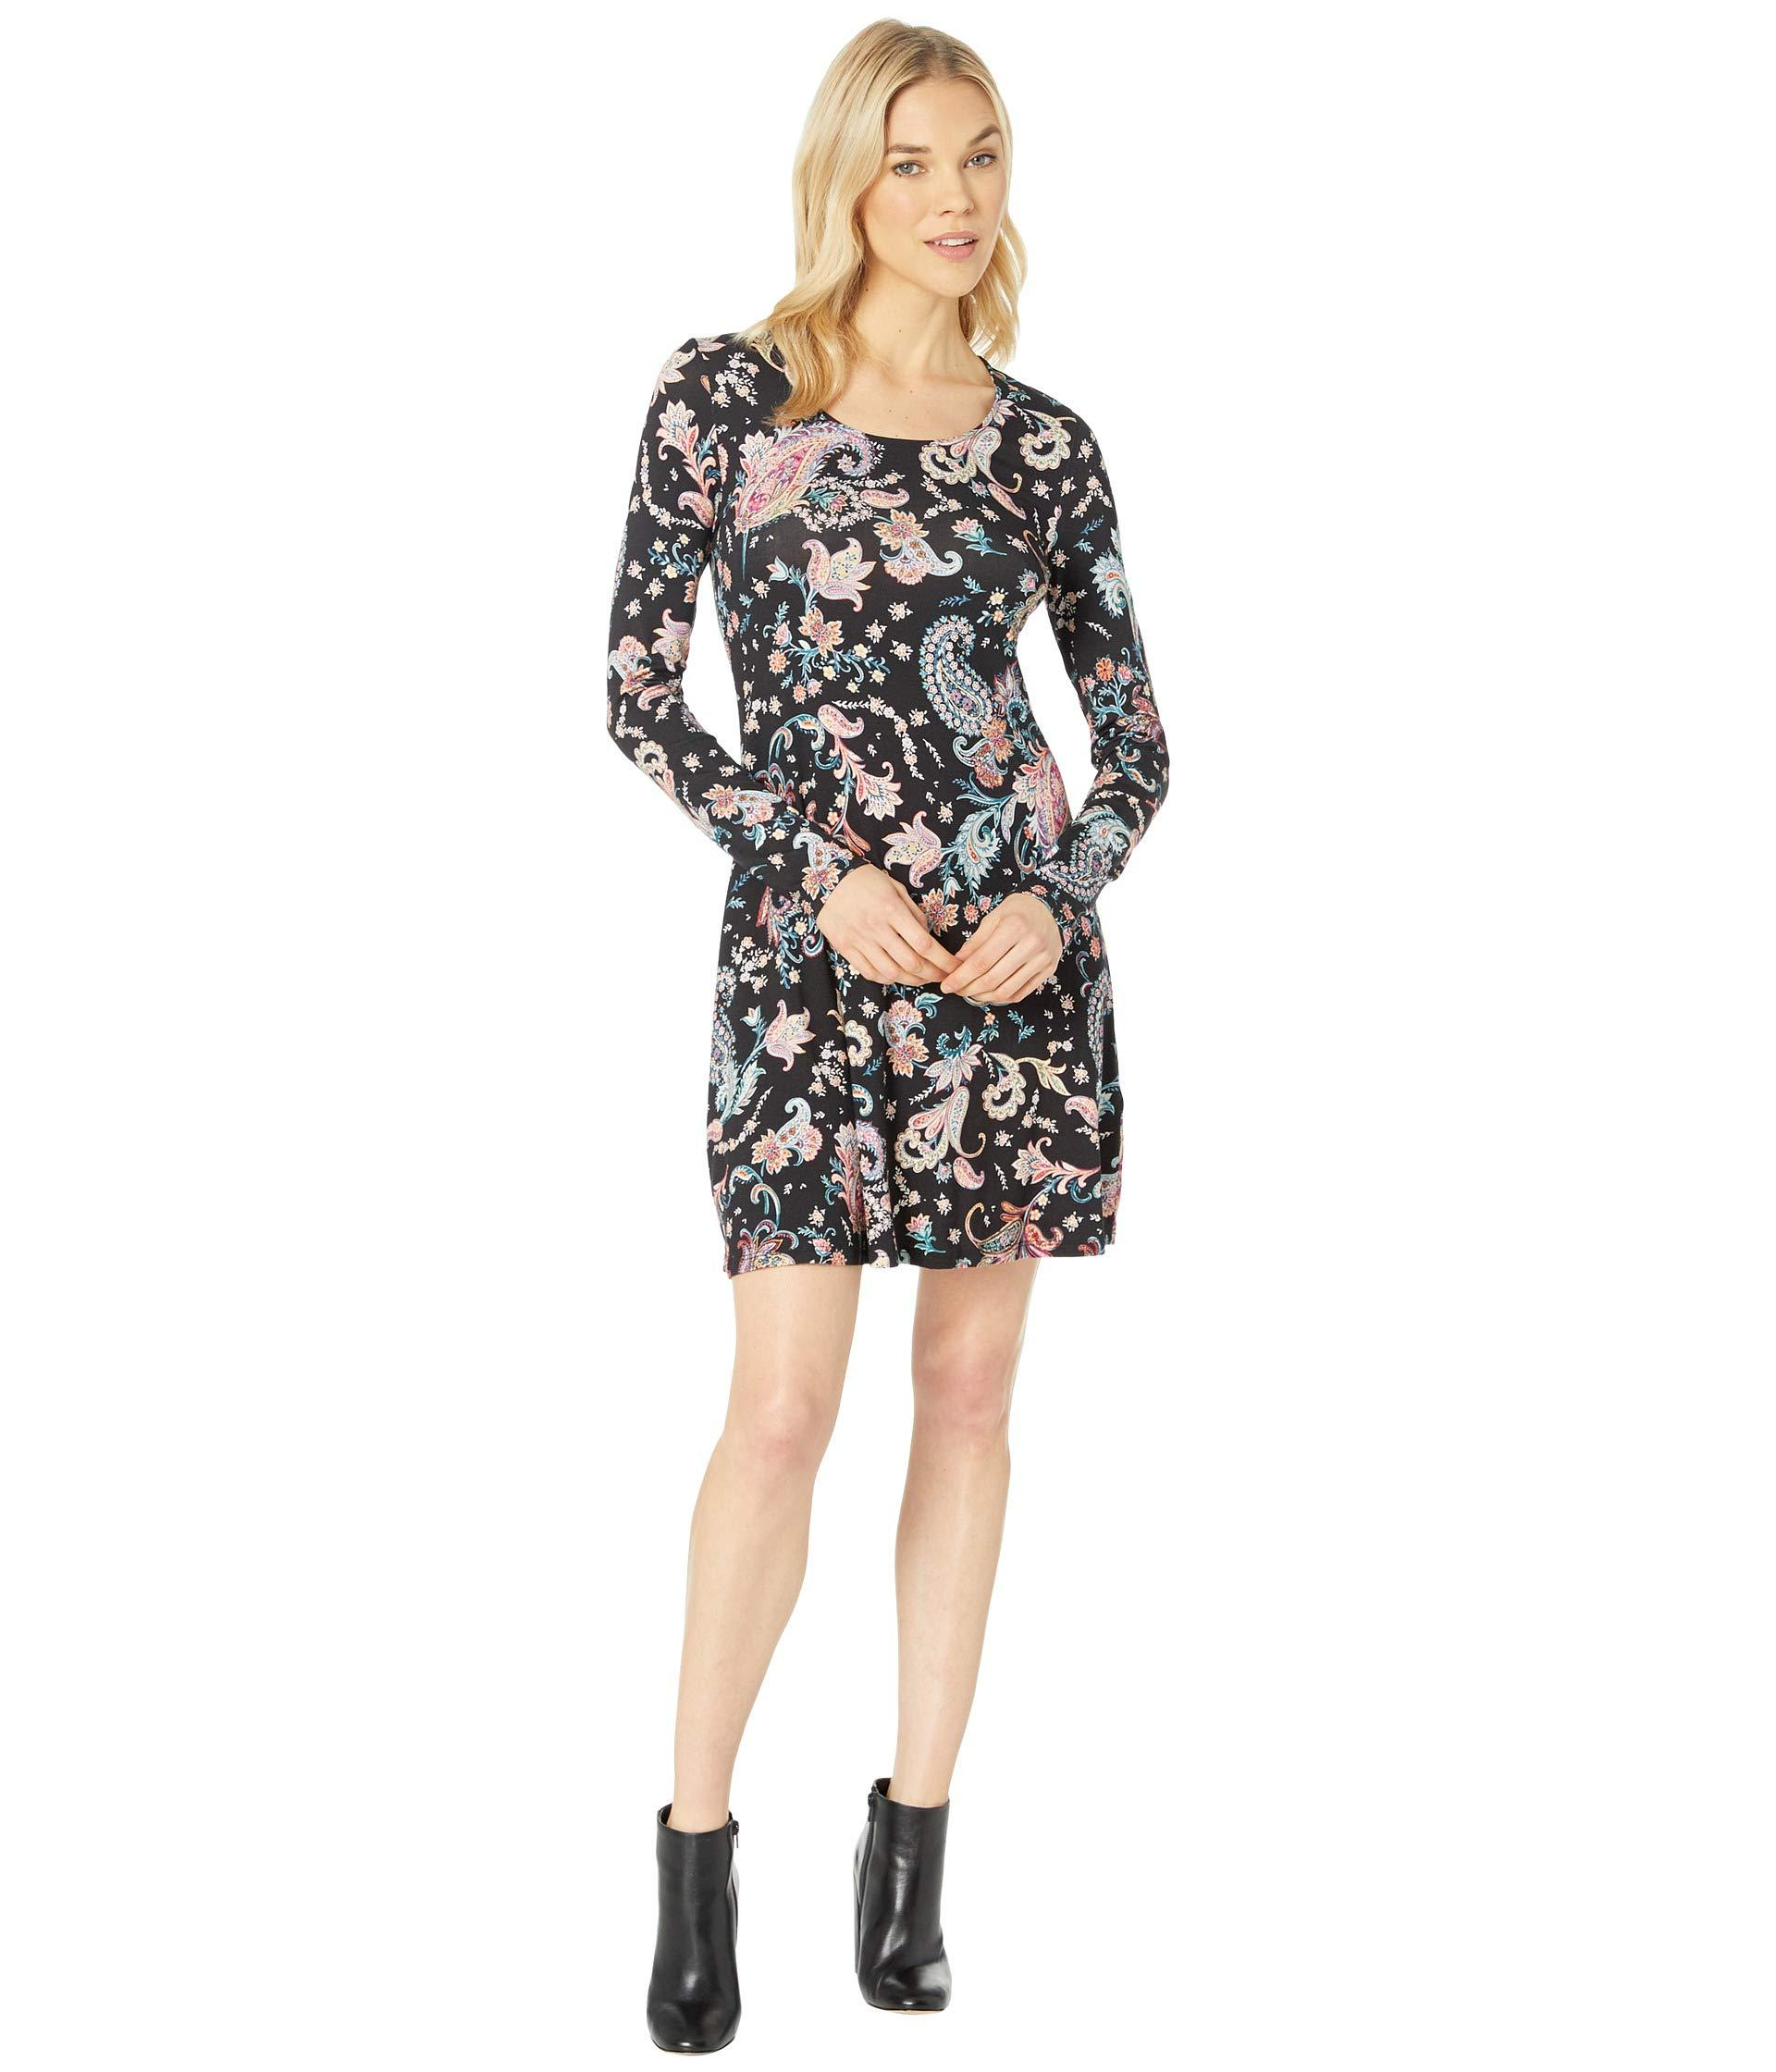 afc126a99c Lyst - Karen Kane Erin A-line Dress in Black - Save 8%